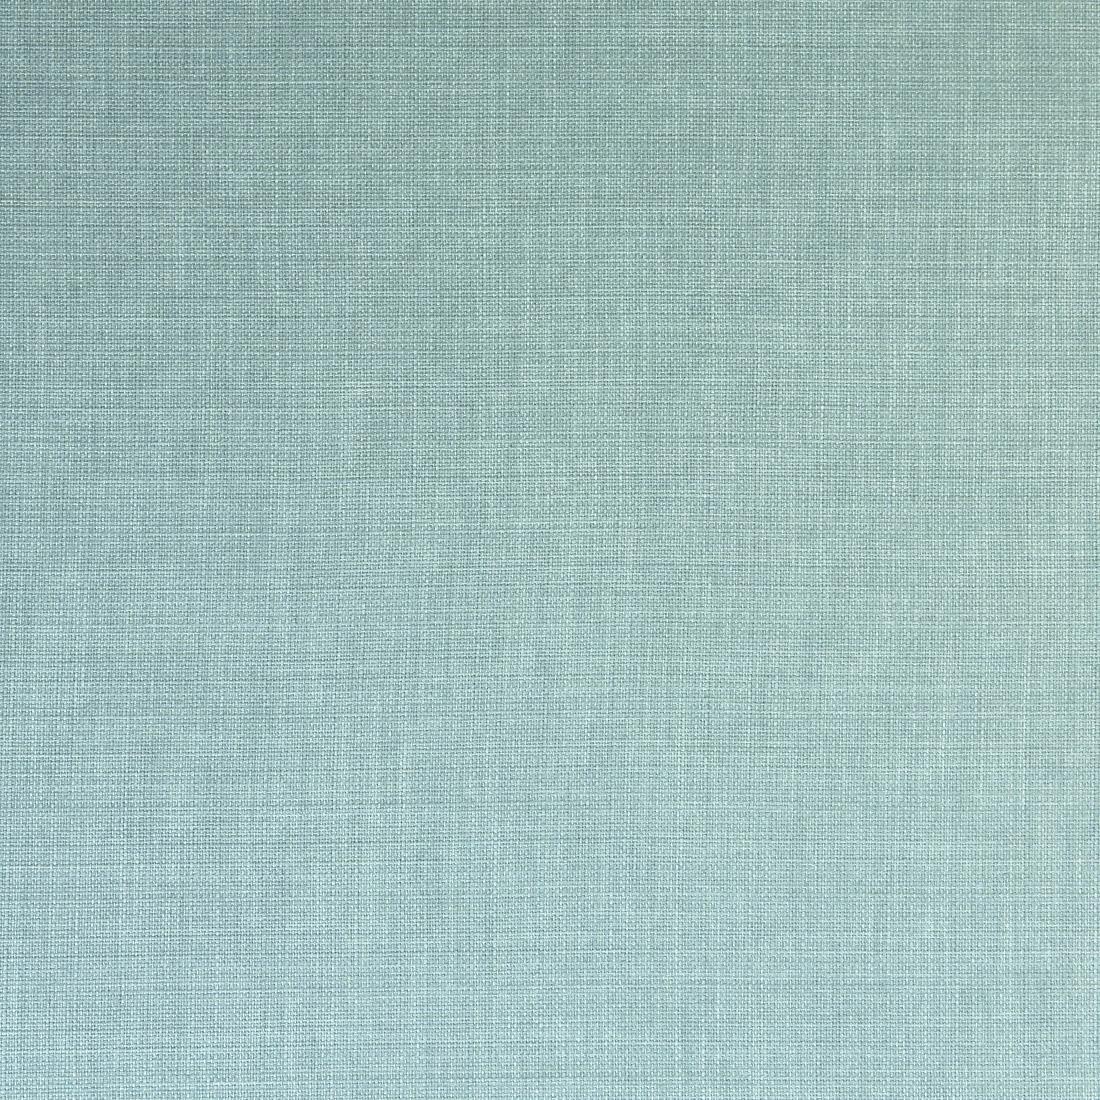 Linoso Cloud Upholstery Fabric